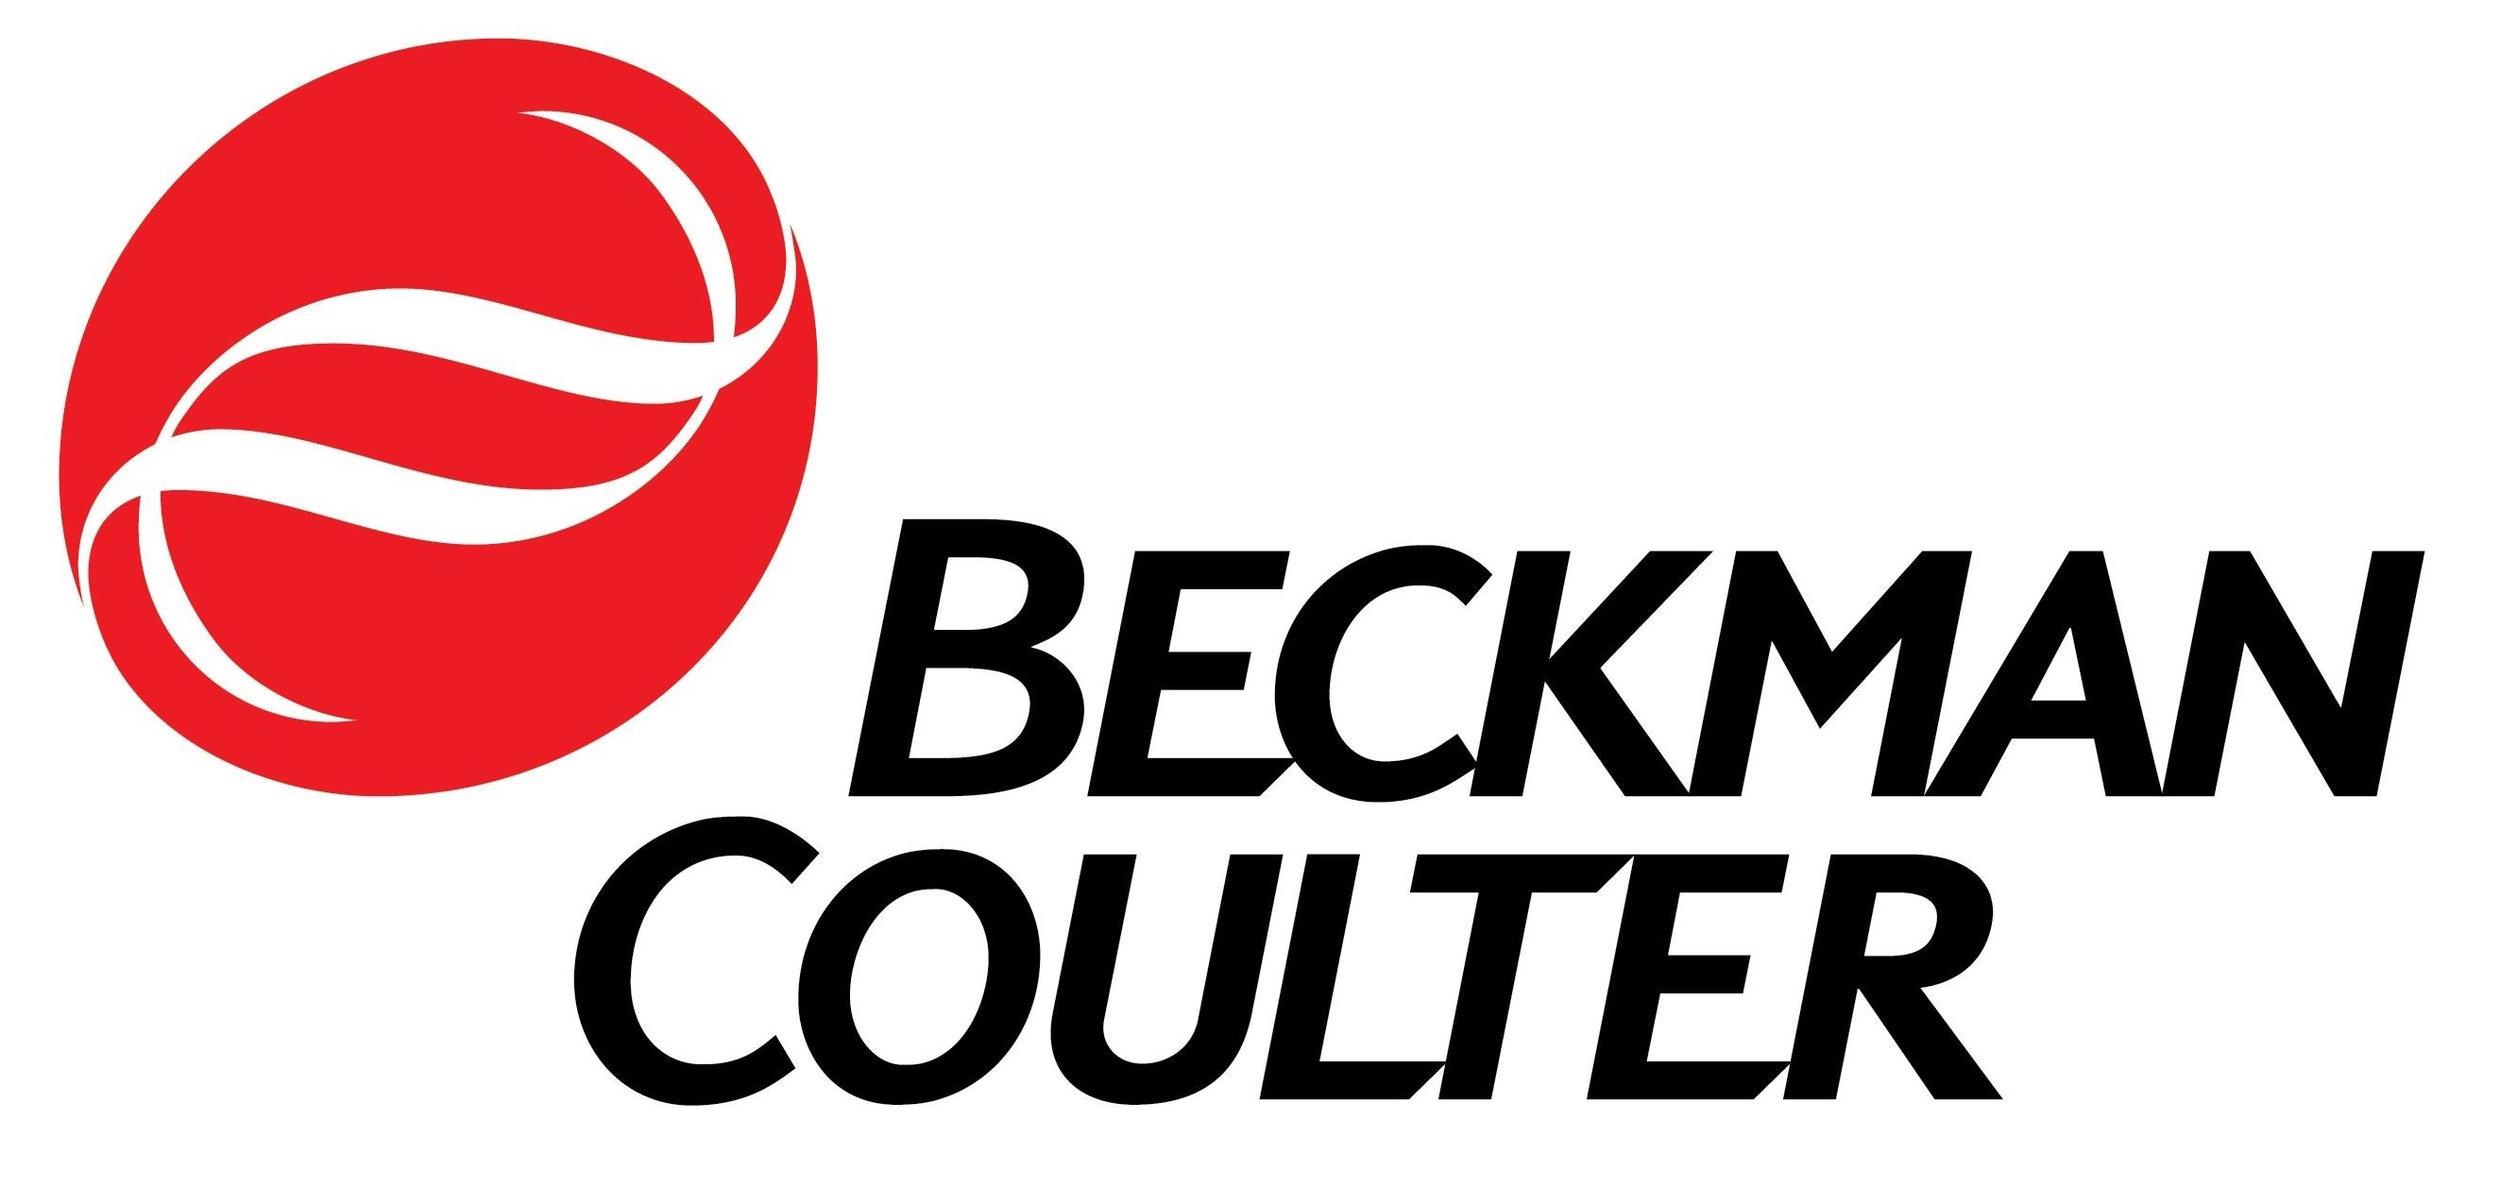 Beckman Coulter.jpg